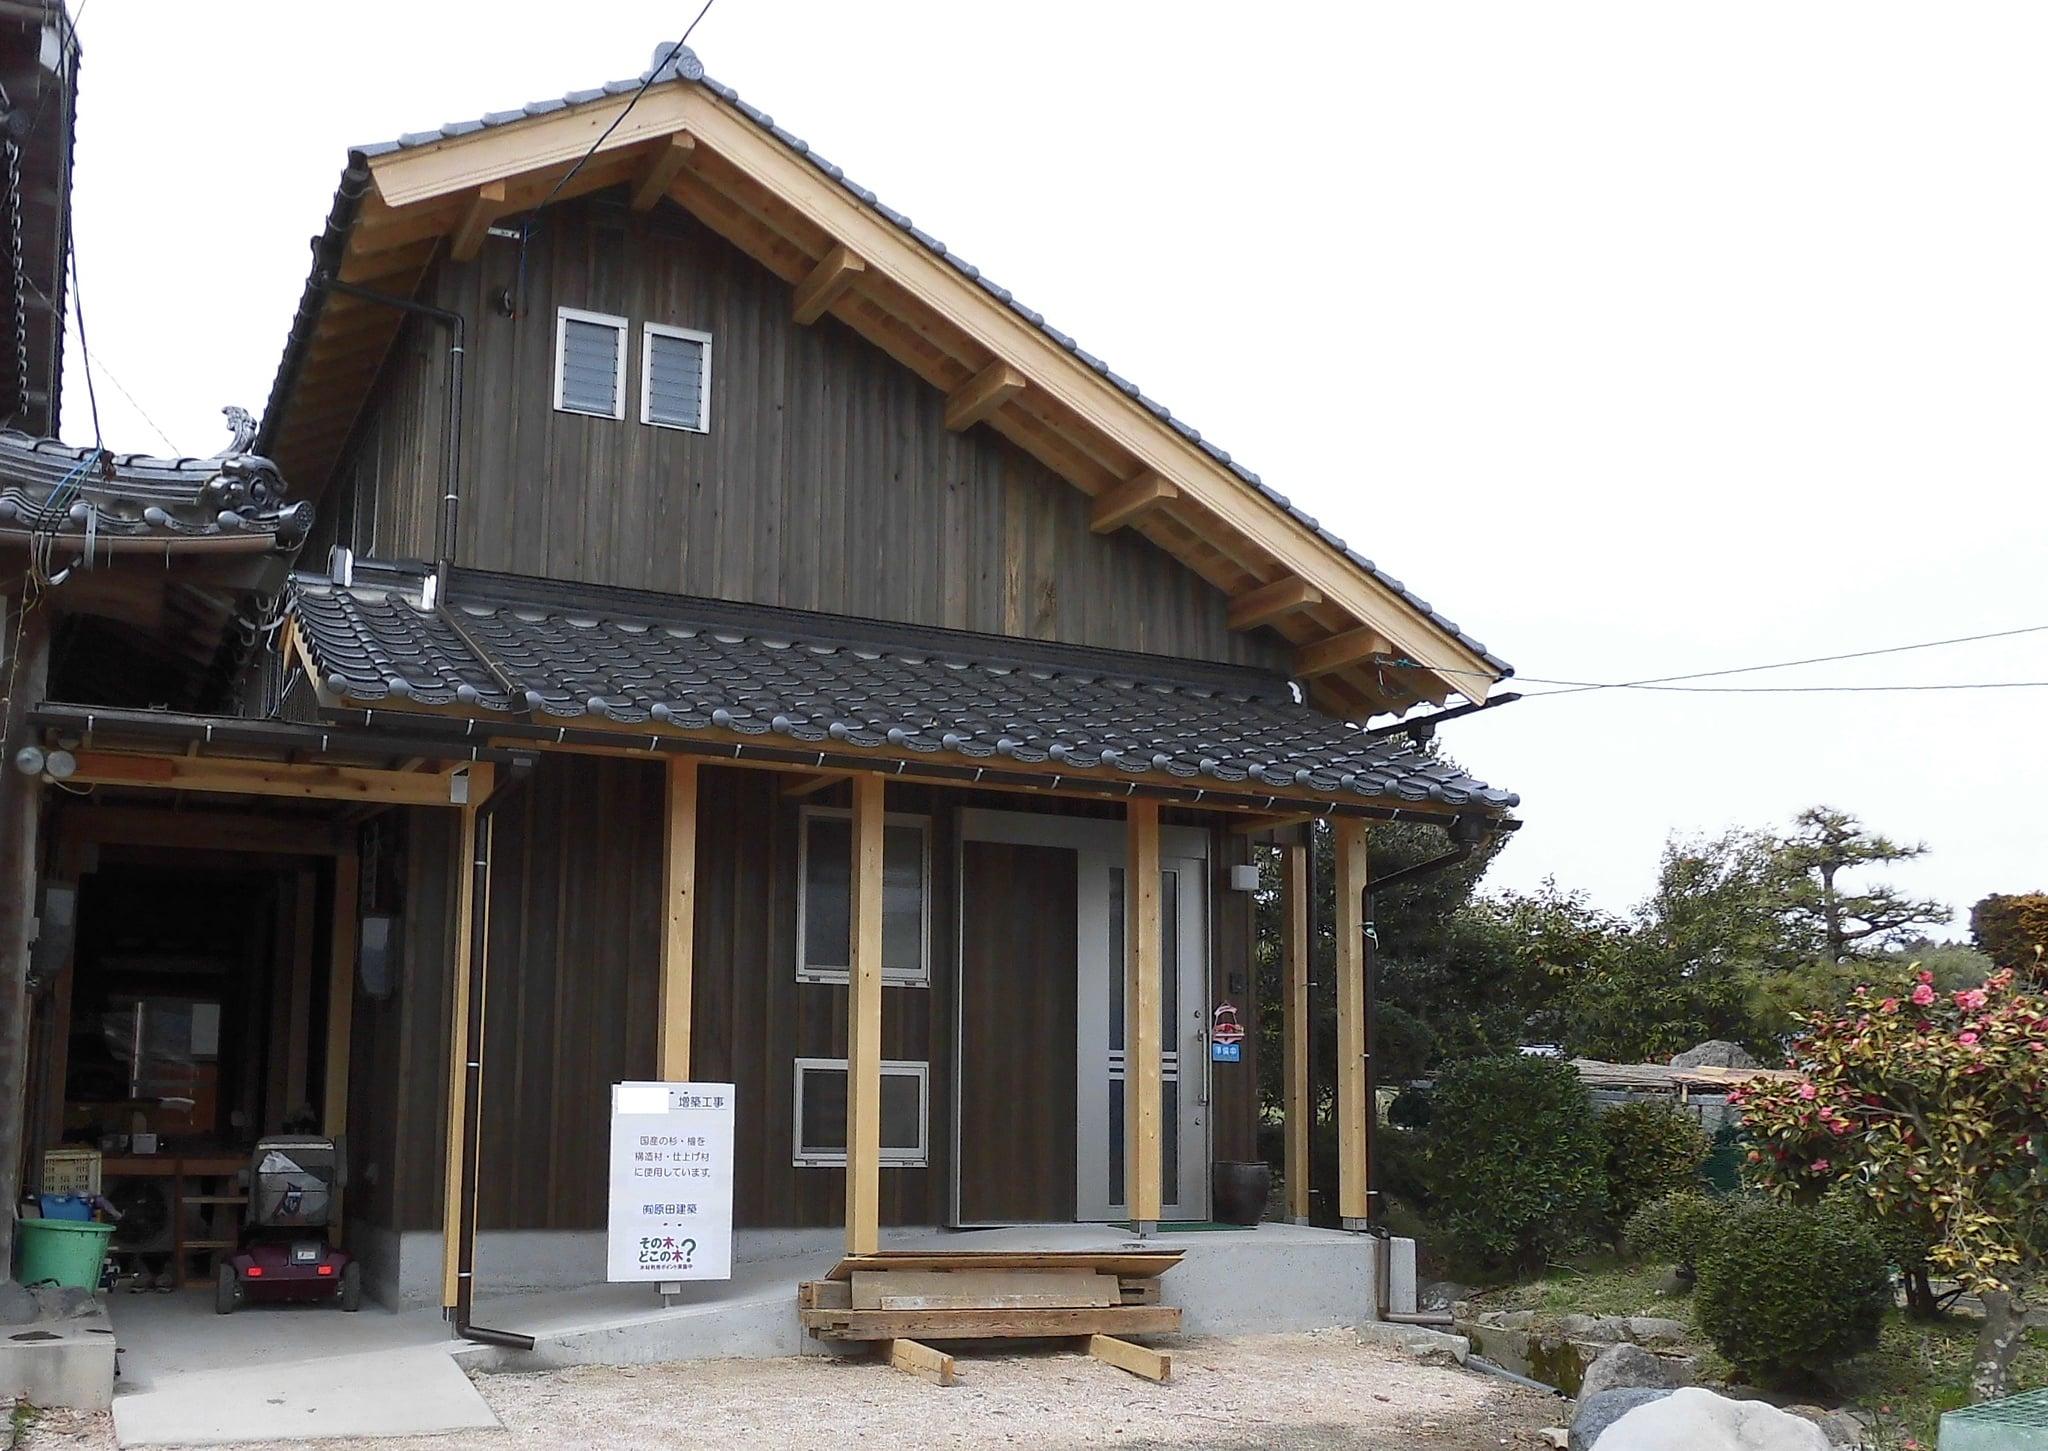 http://ogura-sekkei.jp/files/libs/58/201706171151568402.jpg